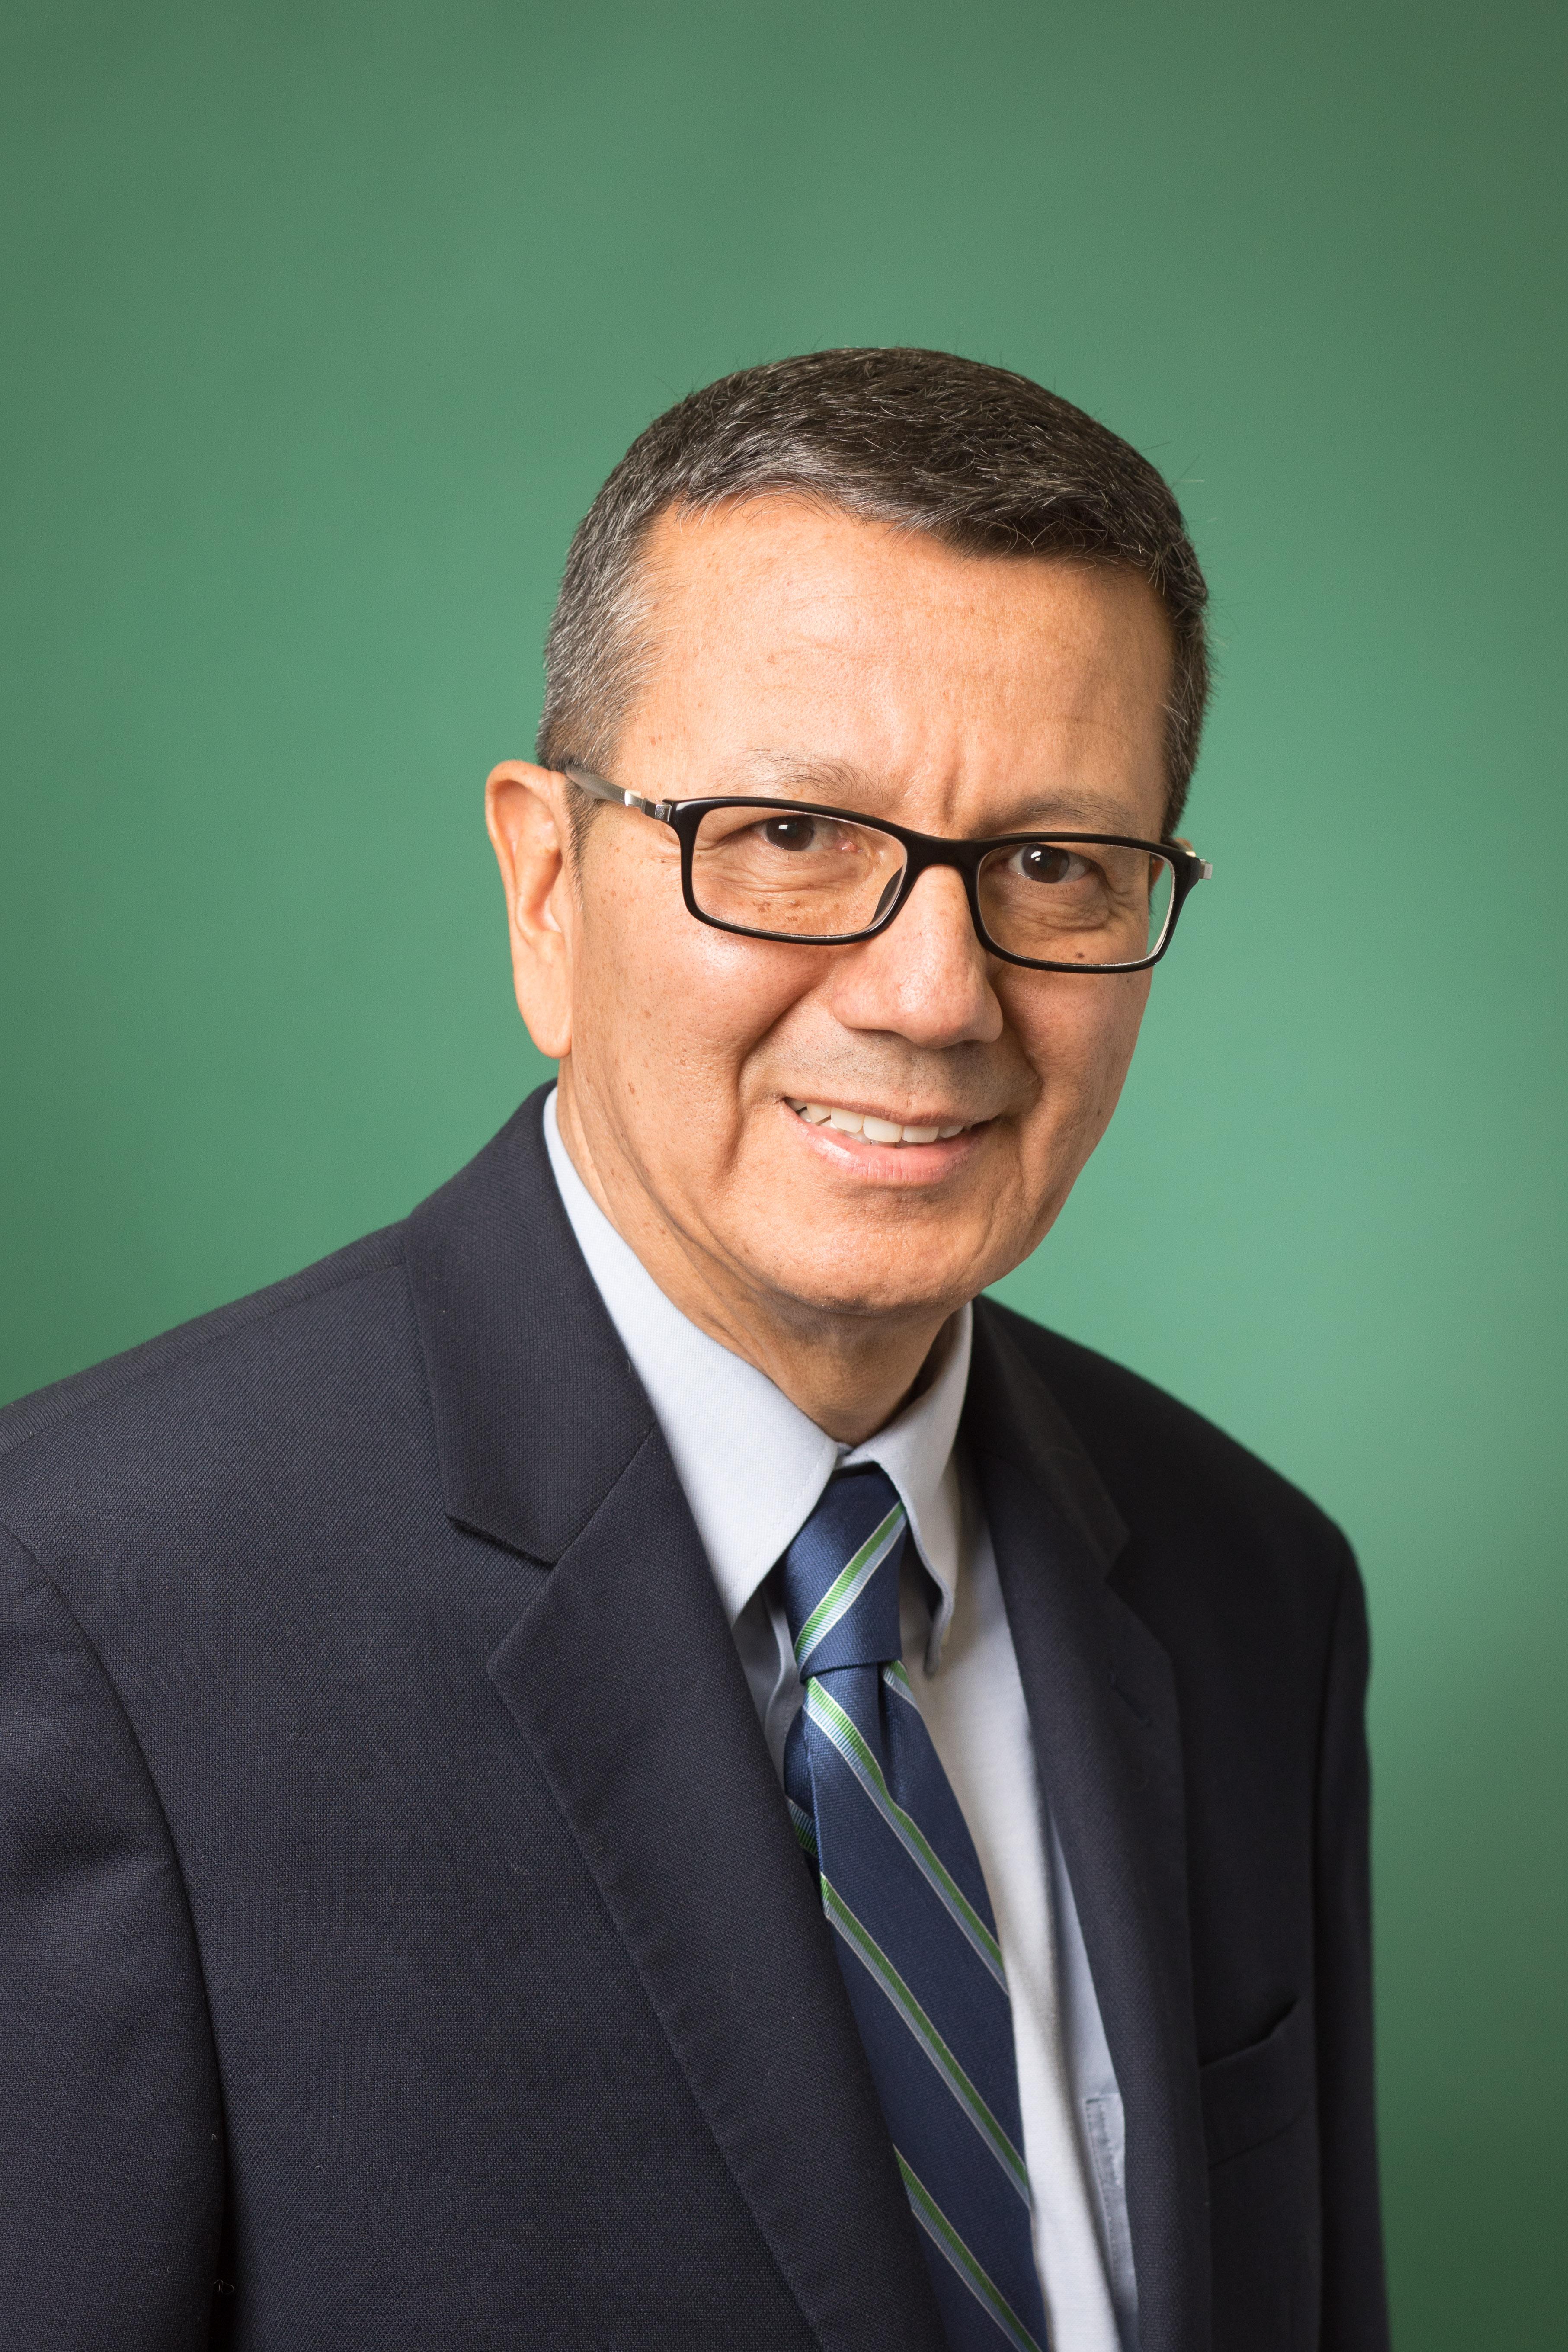 Peter M. Basto